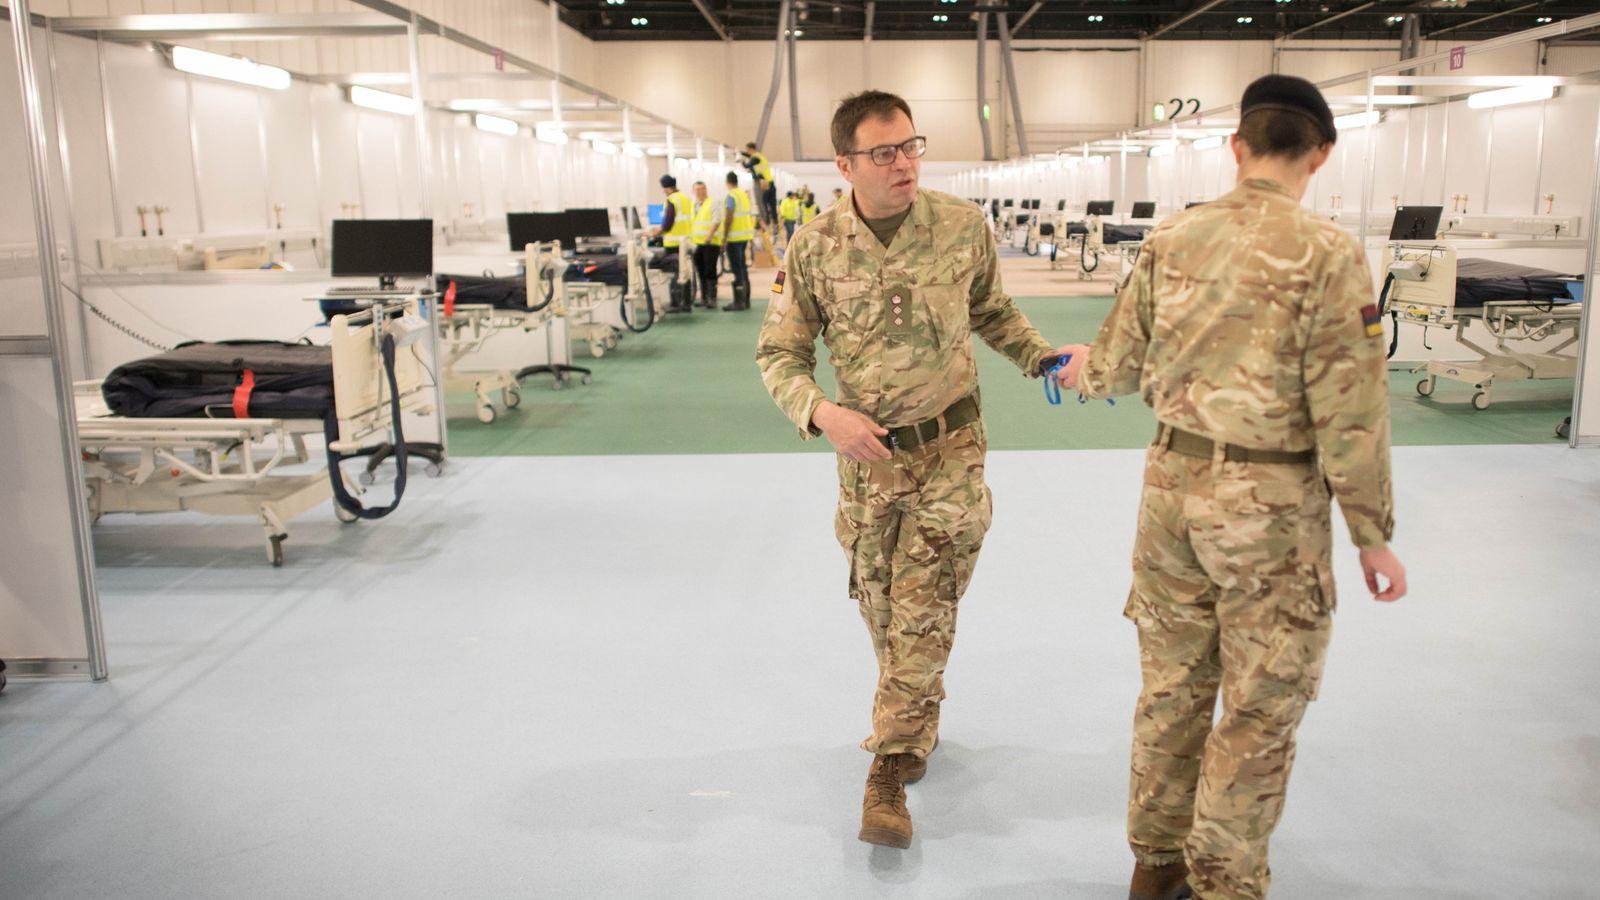 Coronavirus: Military chief helping build London's Nightingale hospital on mission to save lives